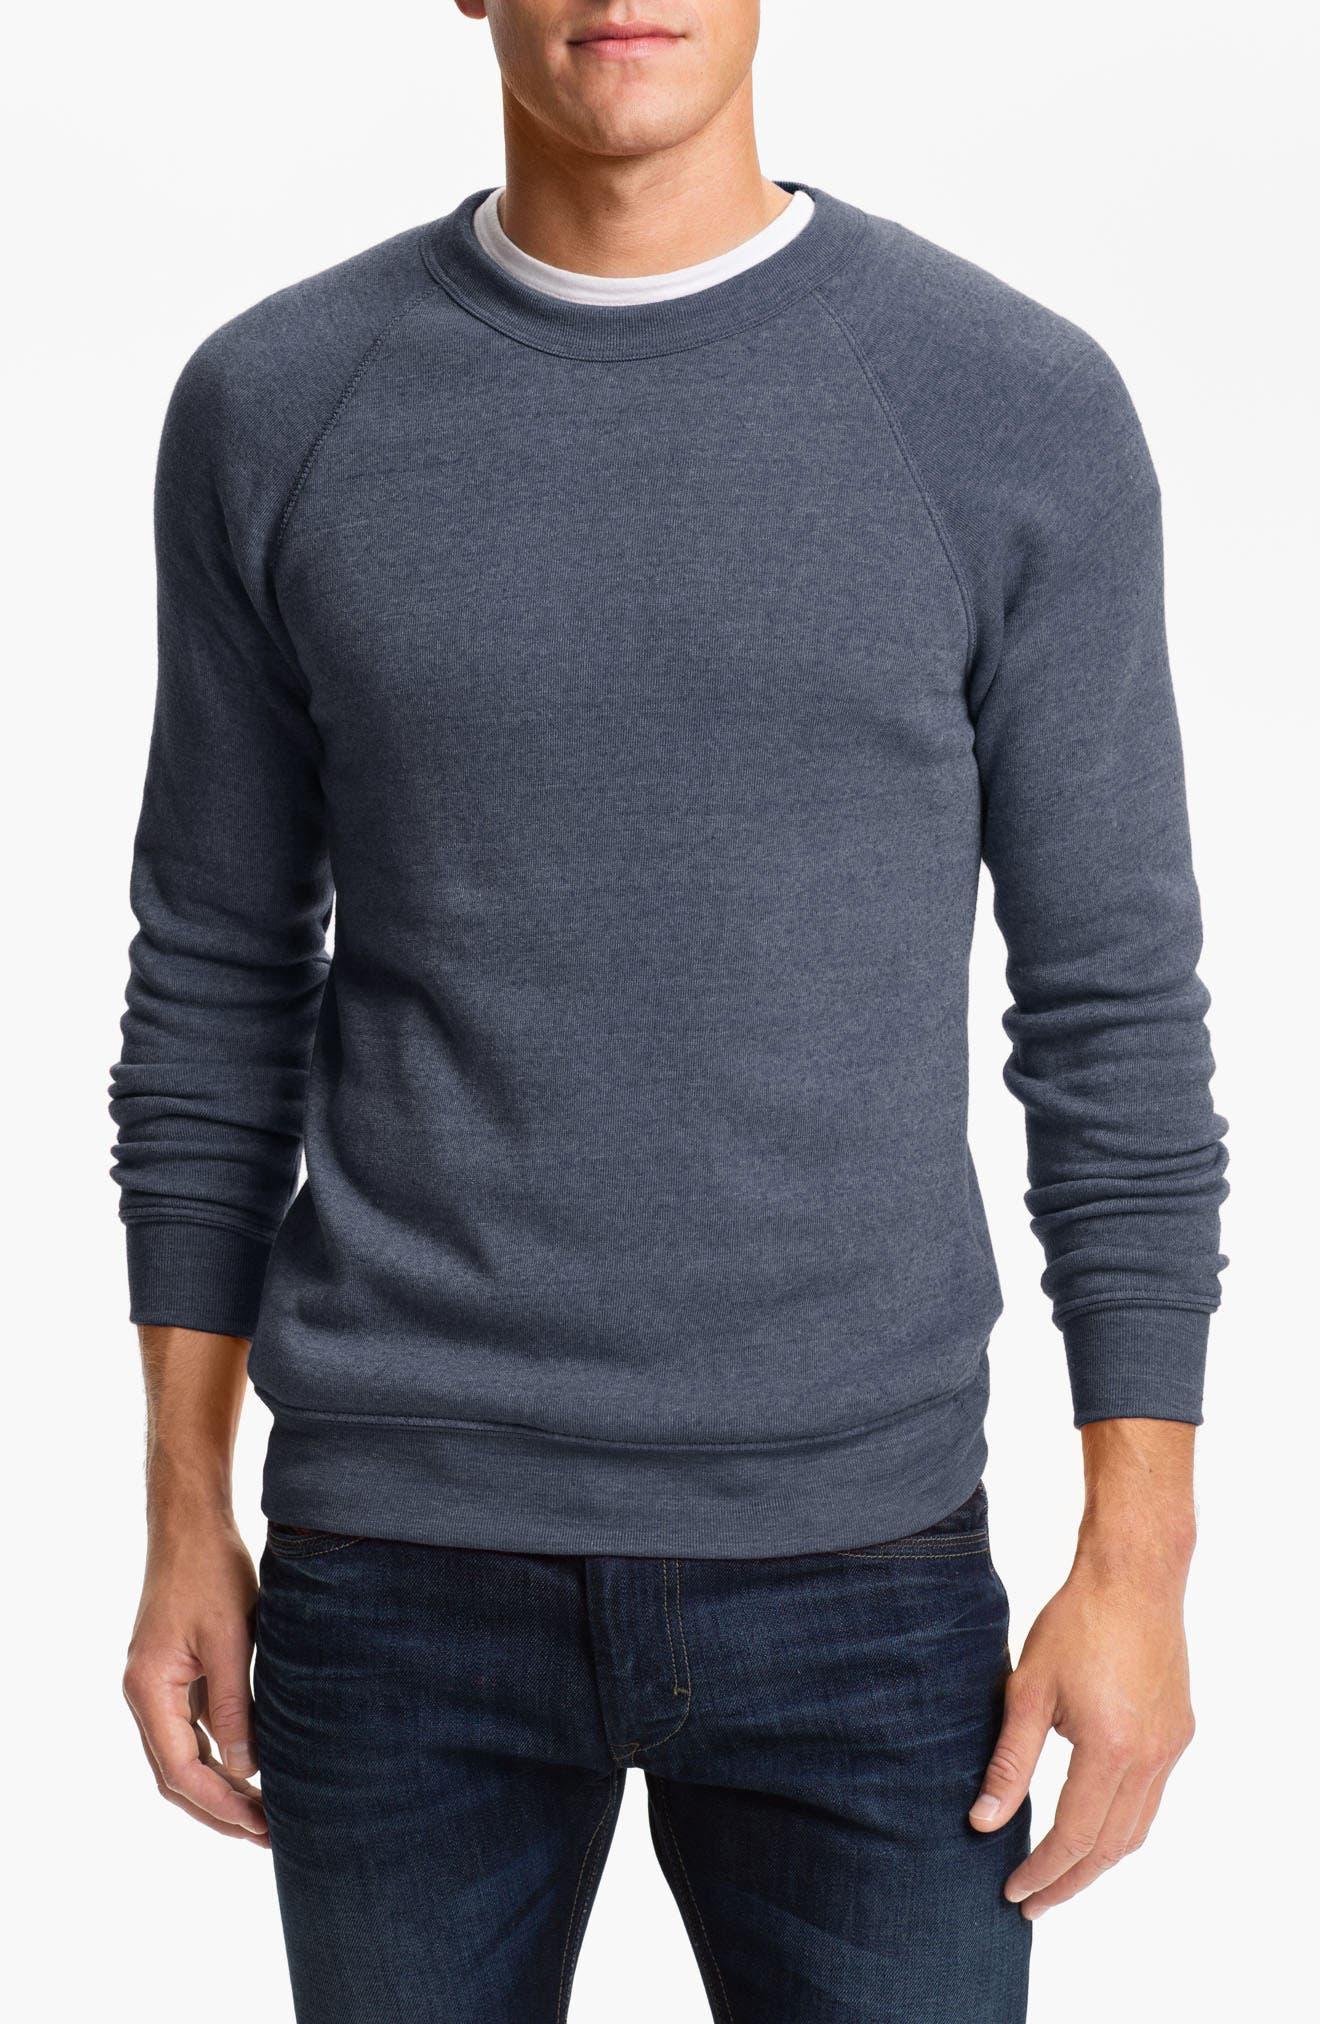 'The Champ' Sweatshirt,                             Alternate thumbnail 25, color,